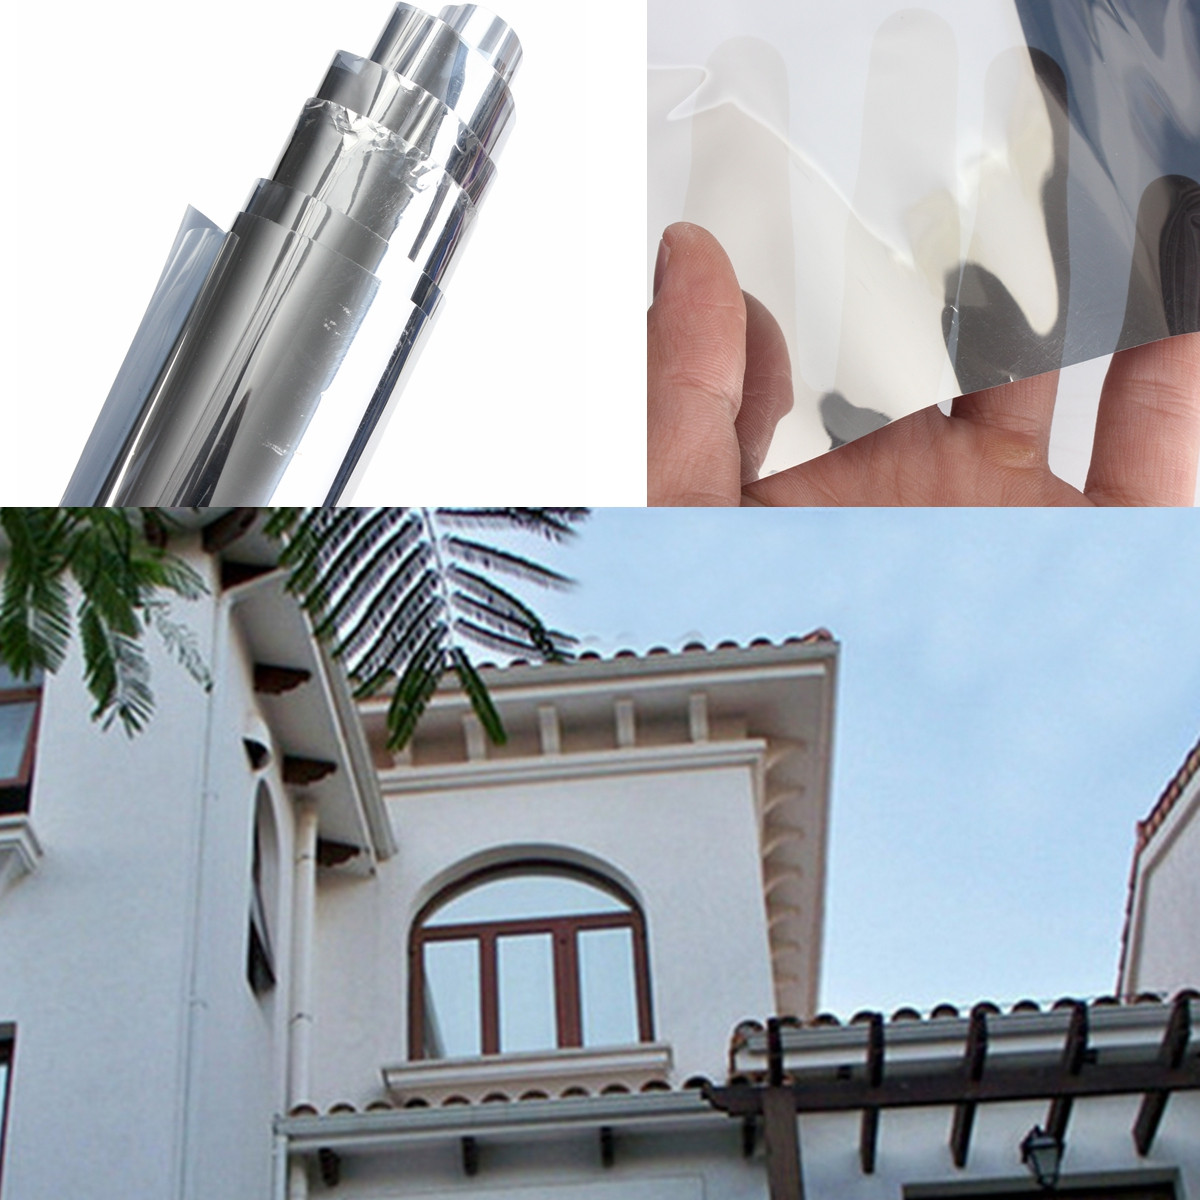 2Pcs 70% VLT Solar Reflective One Way Mirror Window Film Insulation Stickers Window Decorative, Silver